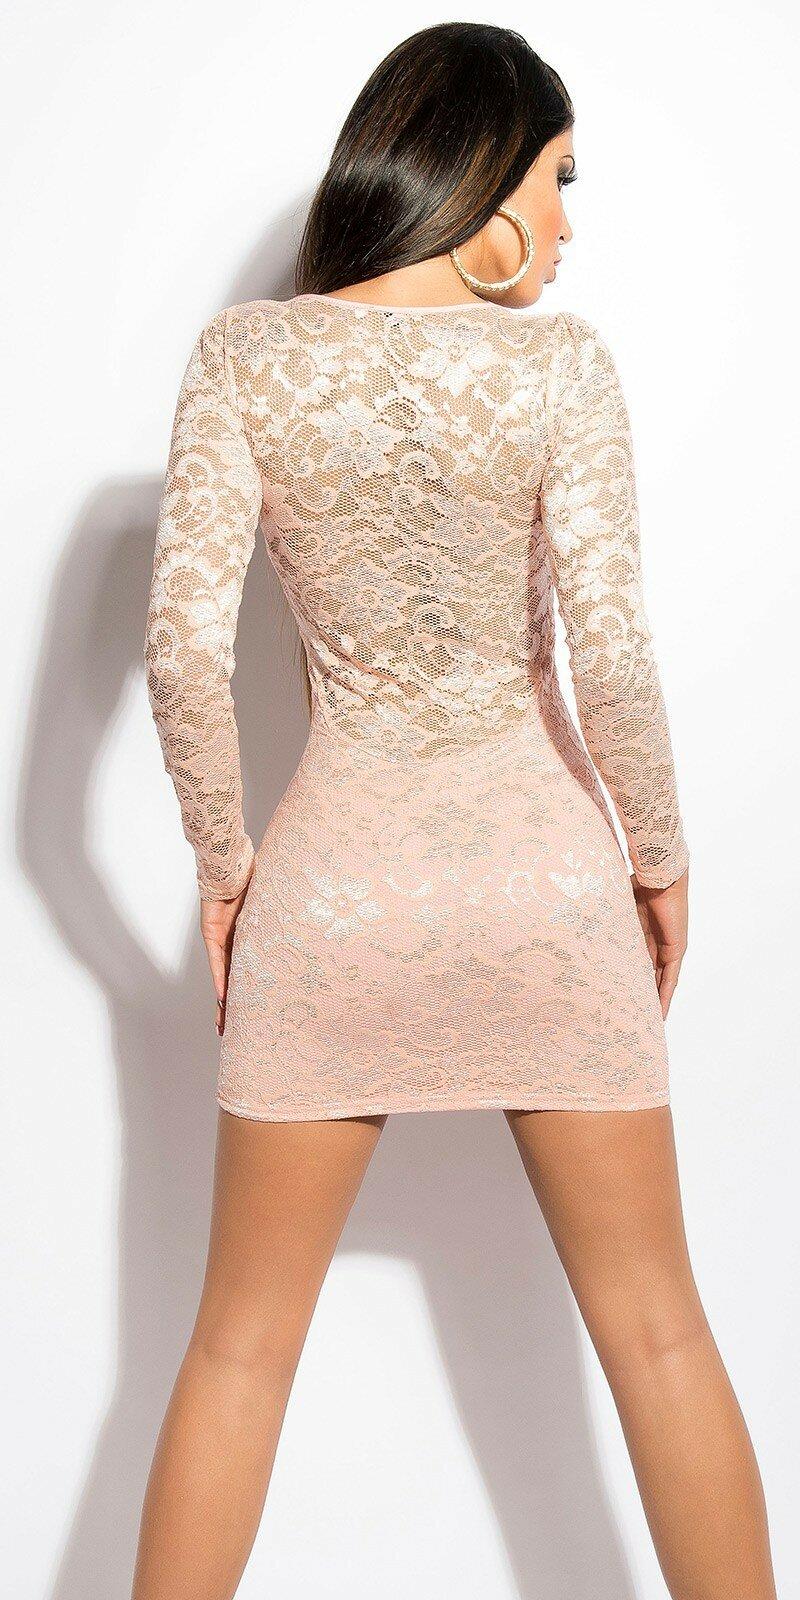 ... Dámske čipkované šaty s dlhým rukávom Bledá ružová ... de2c2824a74